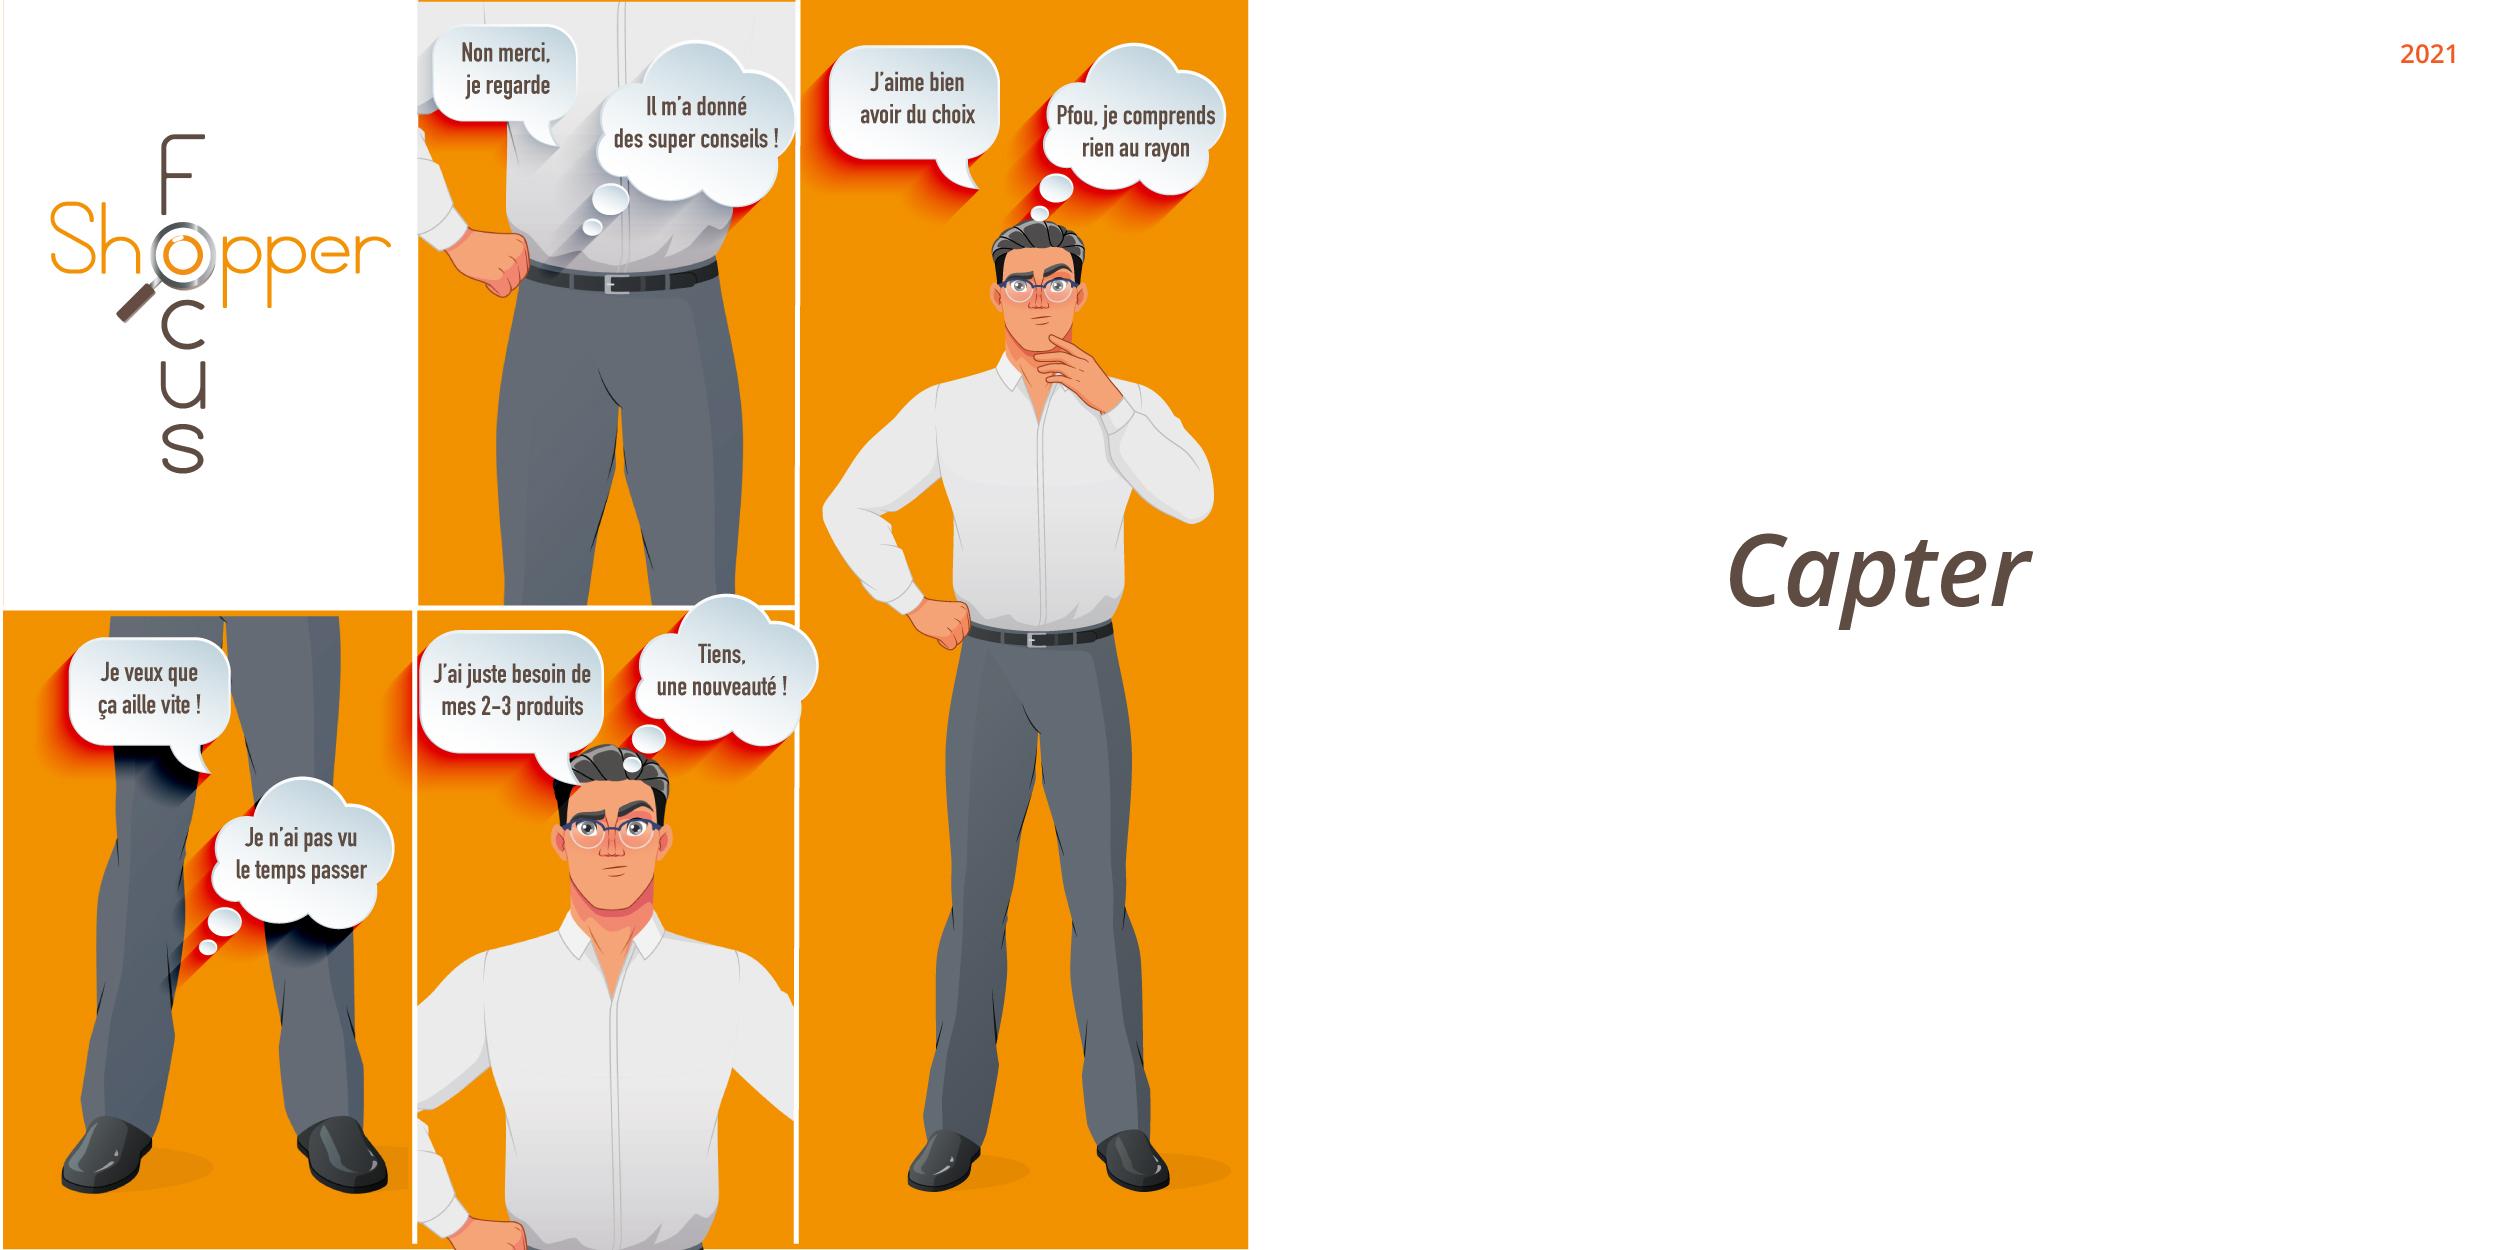 capter-contradictions-shopper